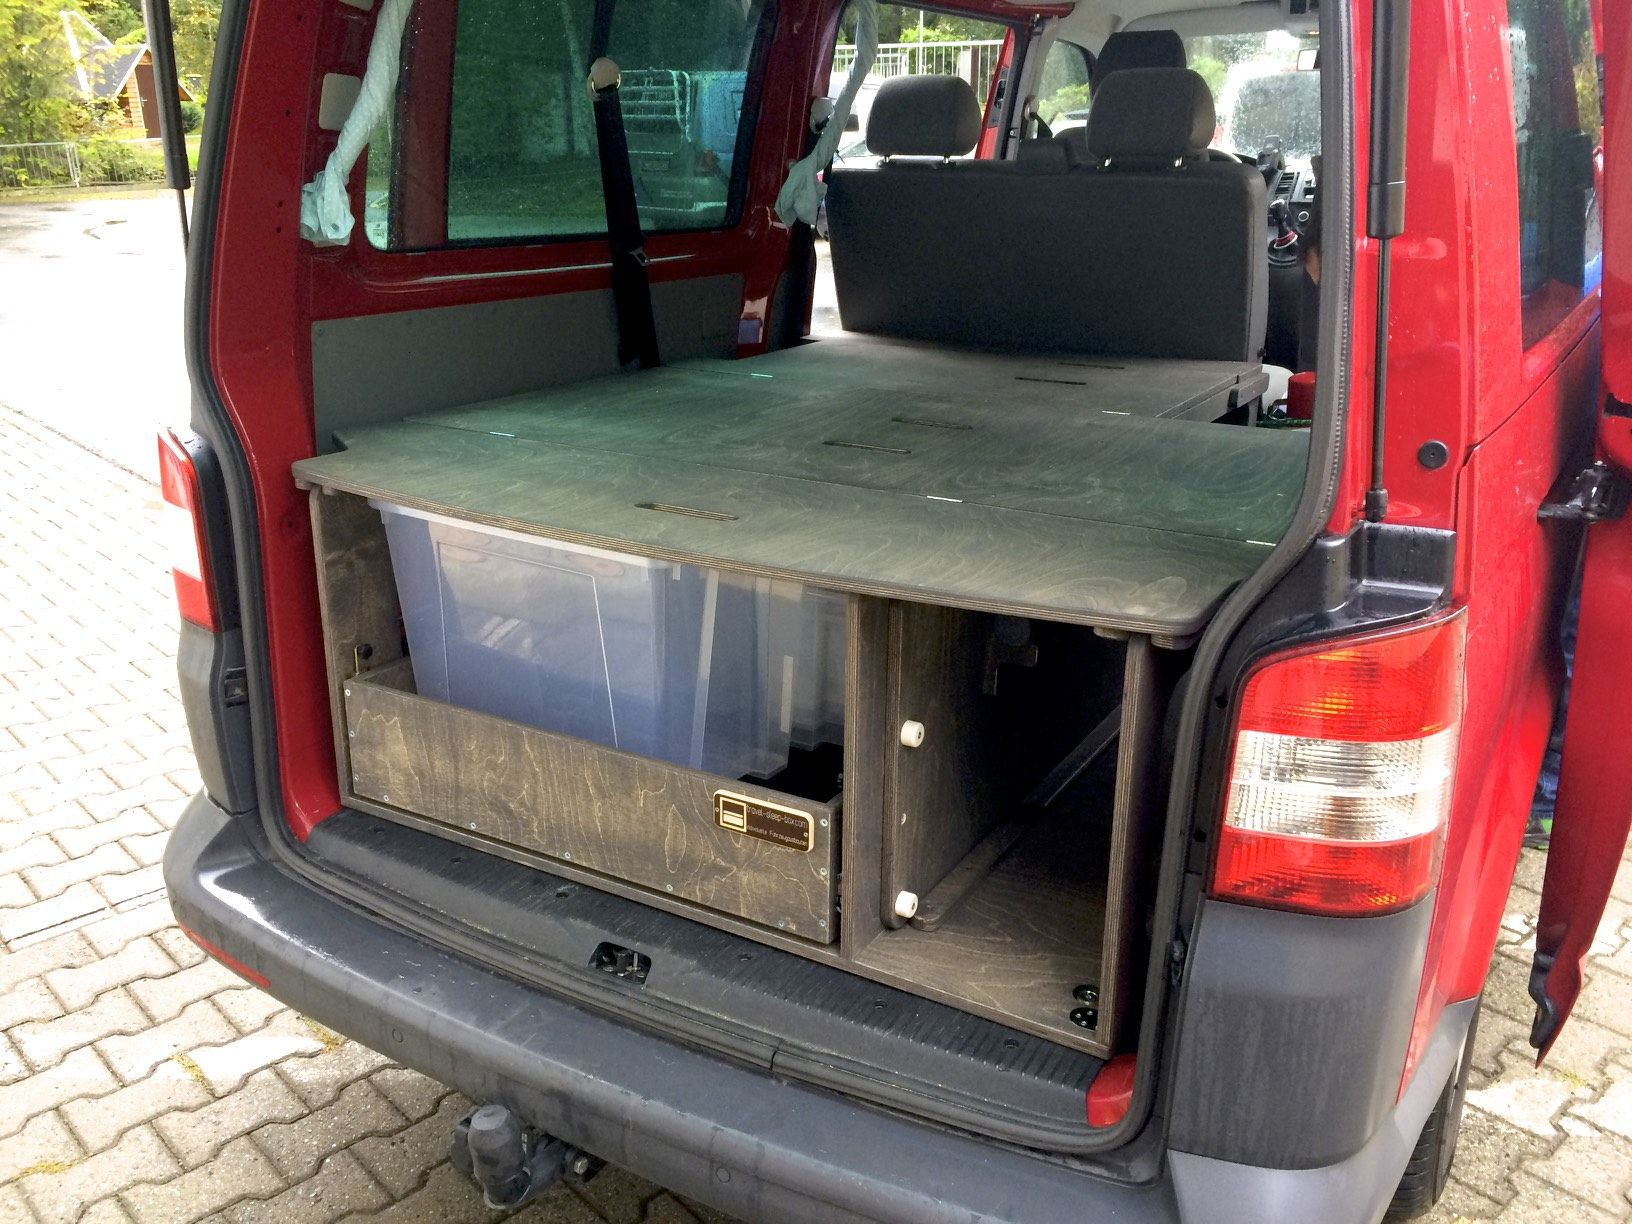 Küchenmodul t ~ Fahrzeugausbau camping multiflexboard alternative vw t5